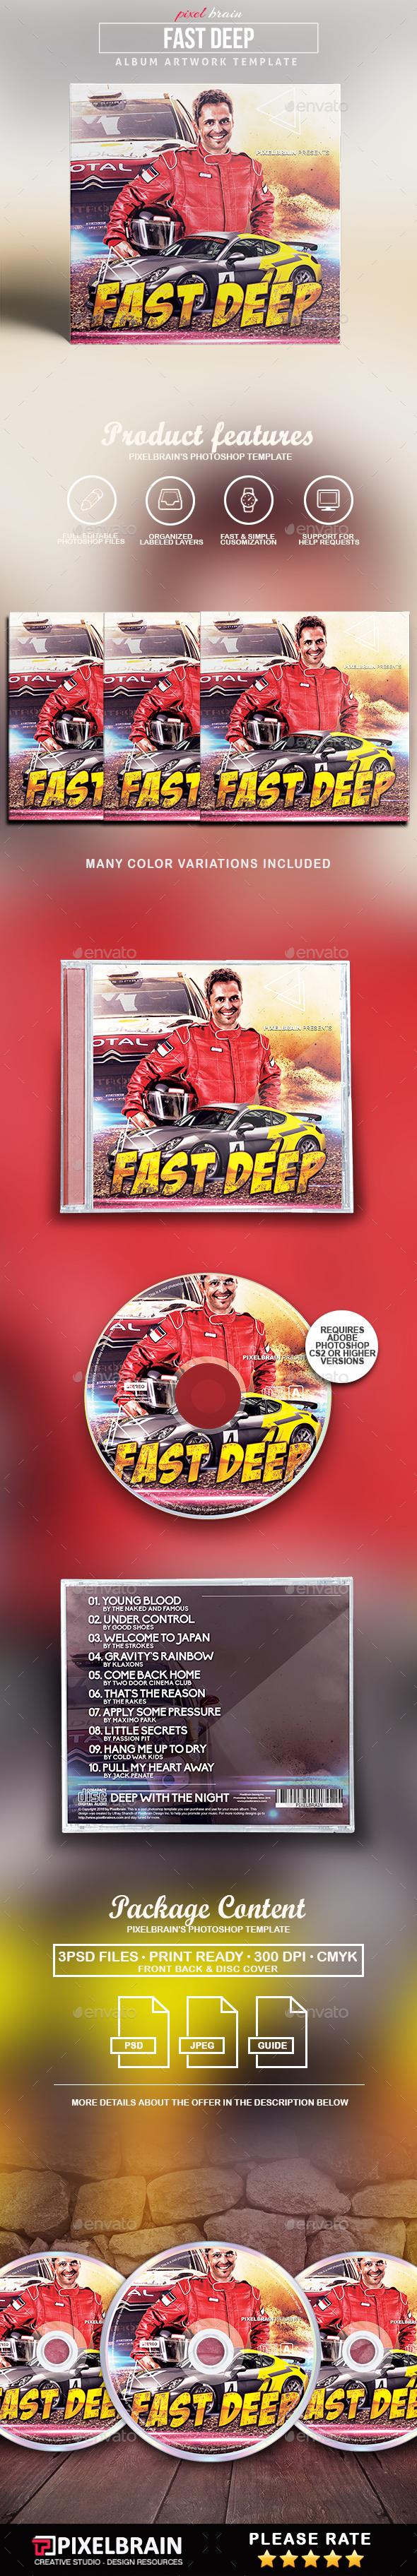 Fast Deep CD Cover Artwork - CD & DVD Artwork Print Templates